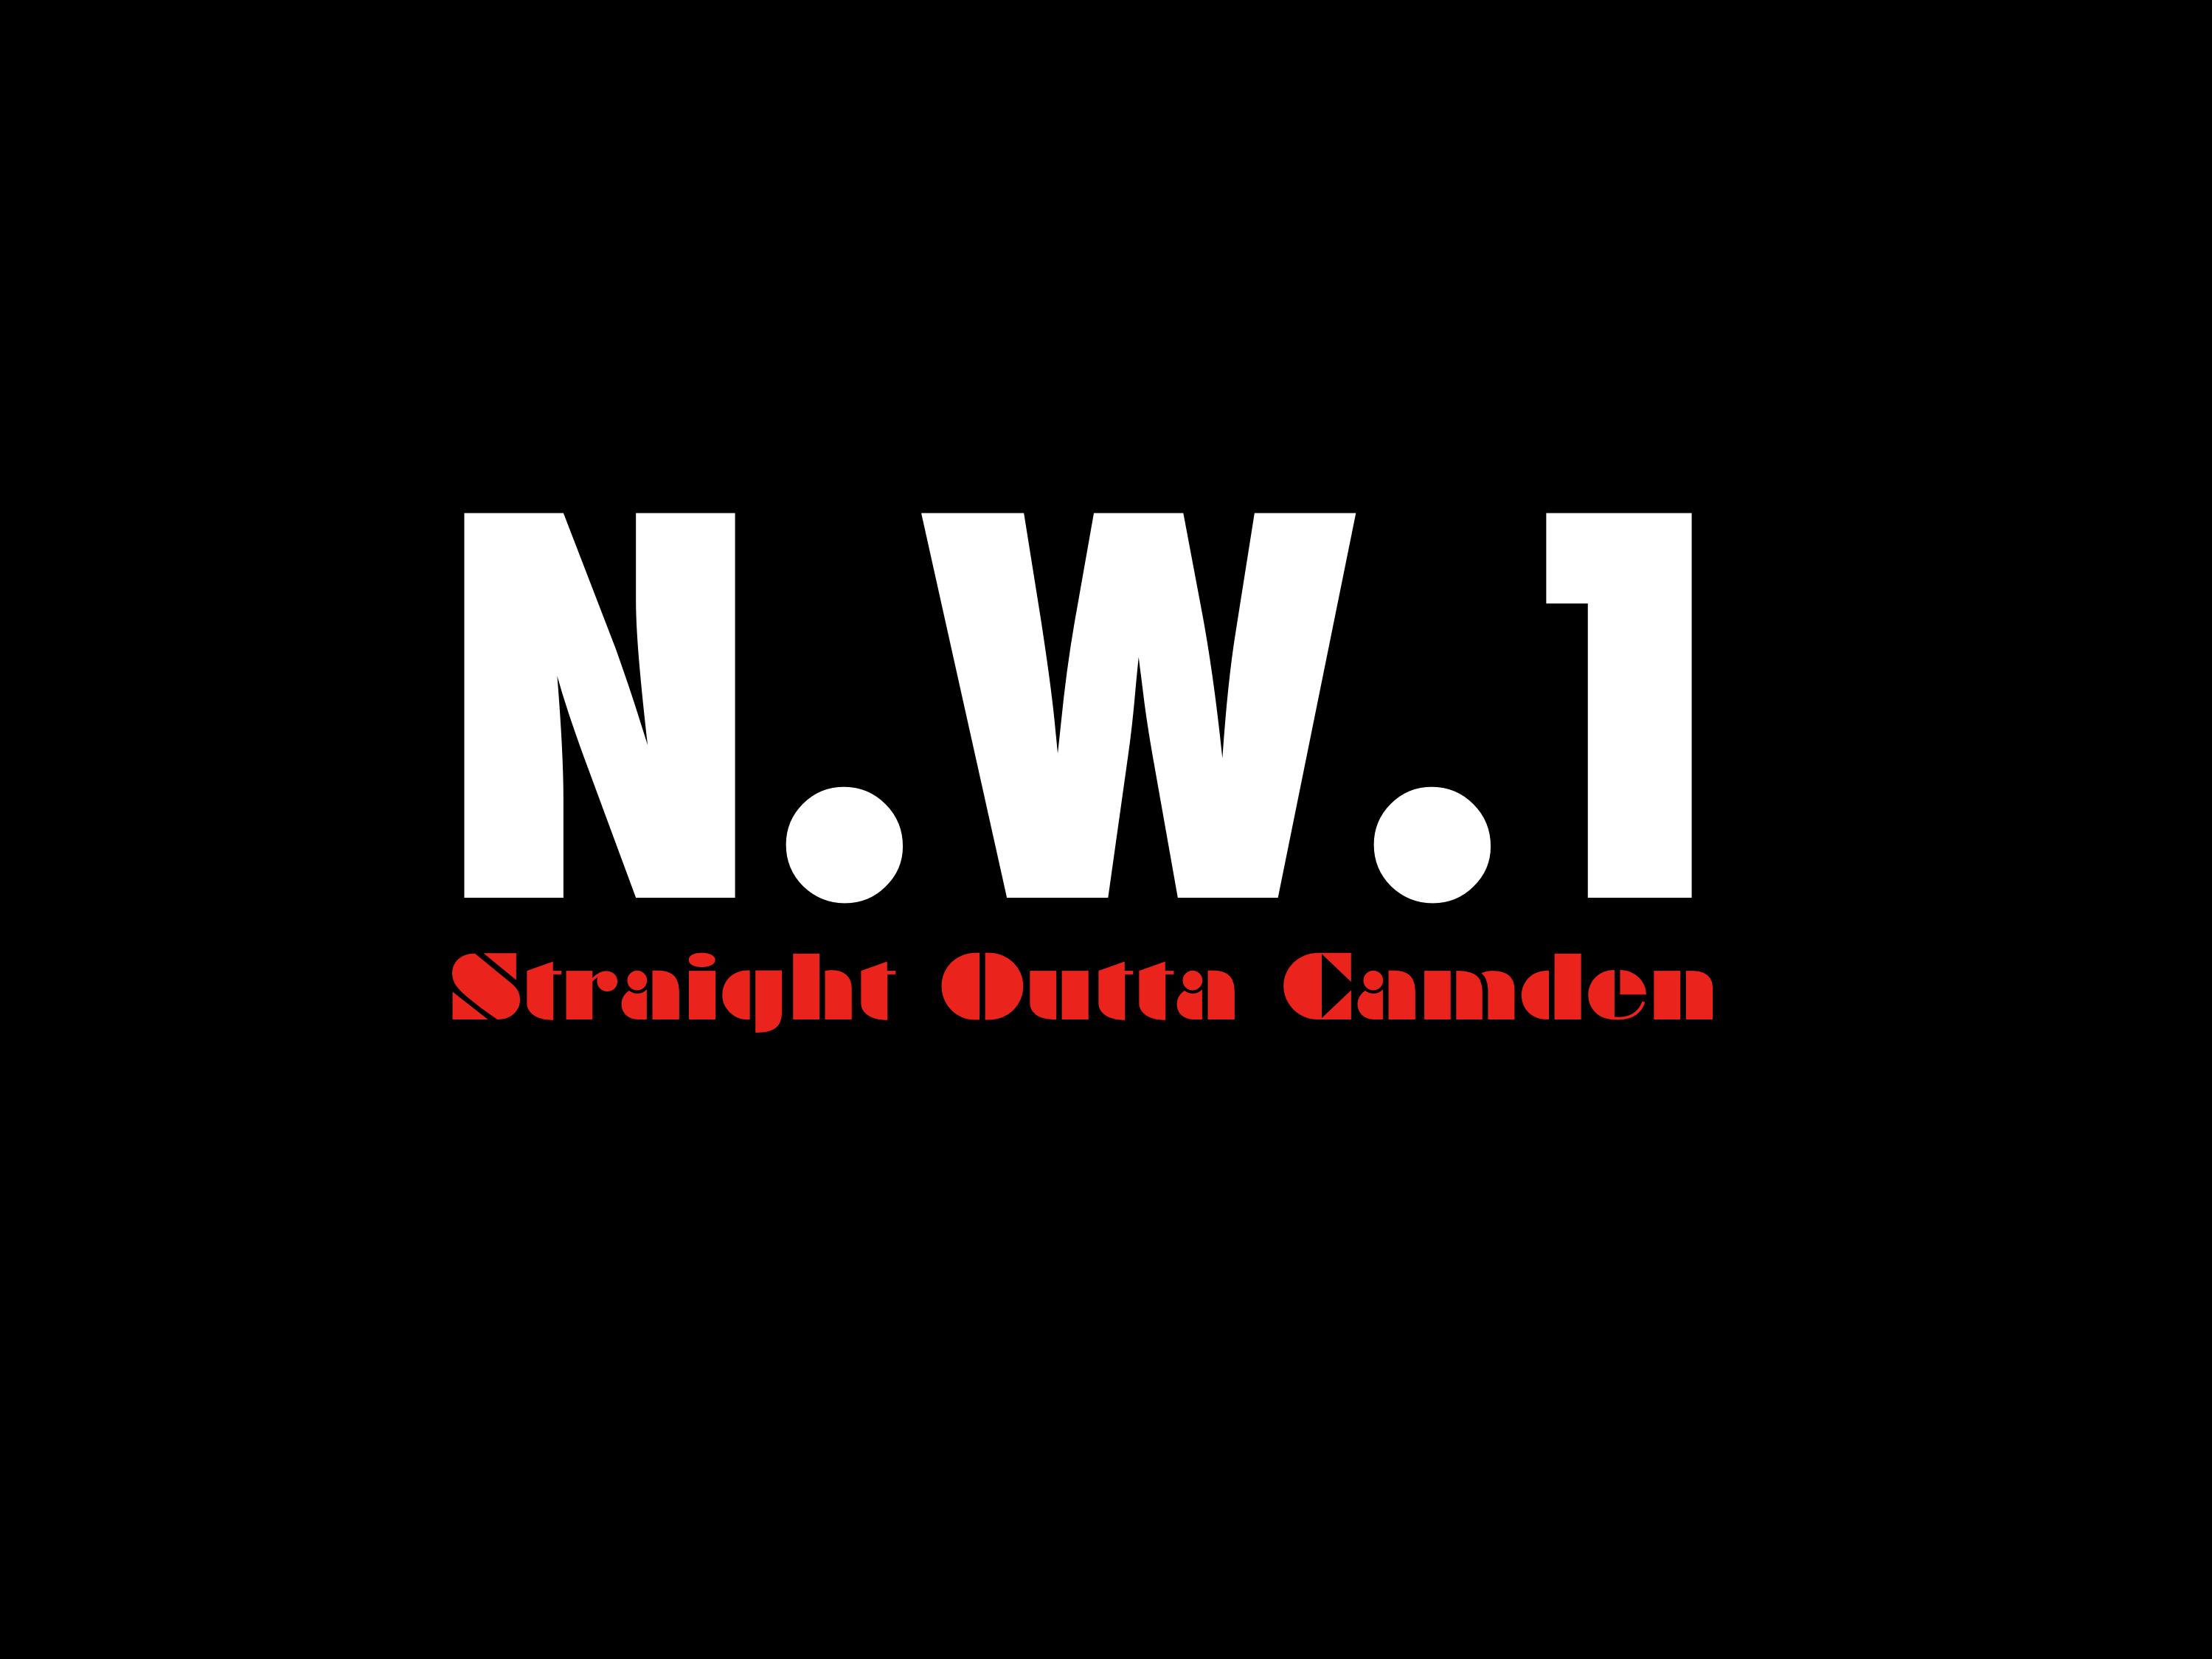 Straight Outta Camden